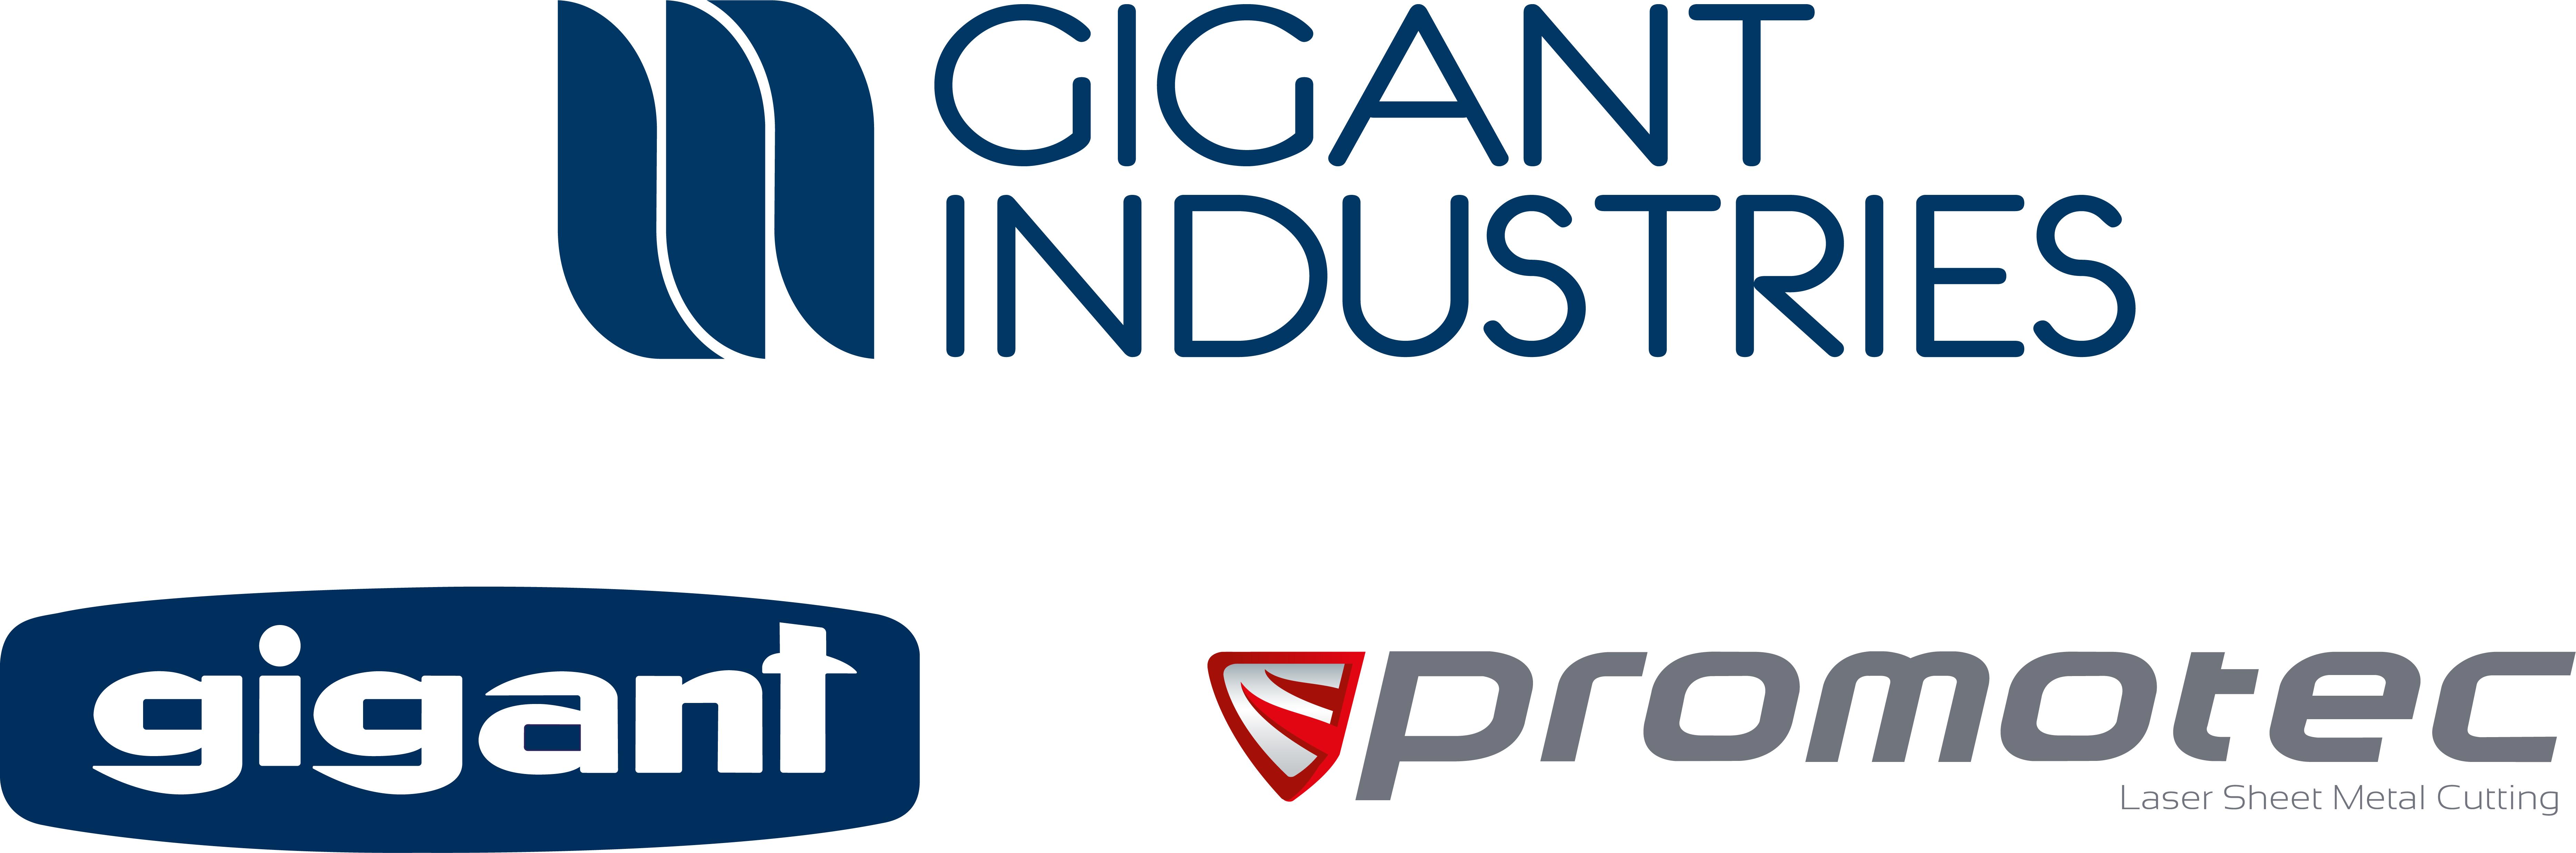 Gigant Industries